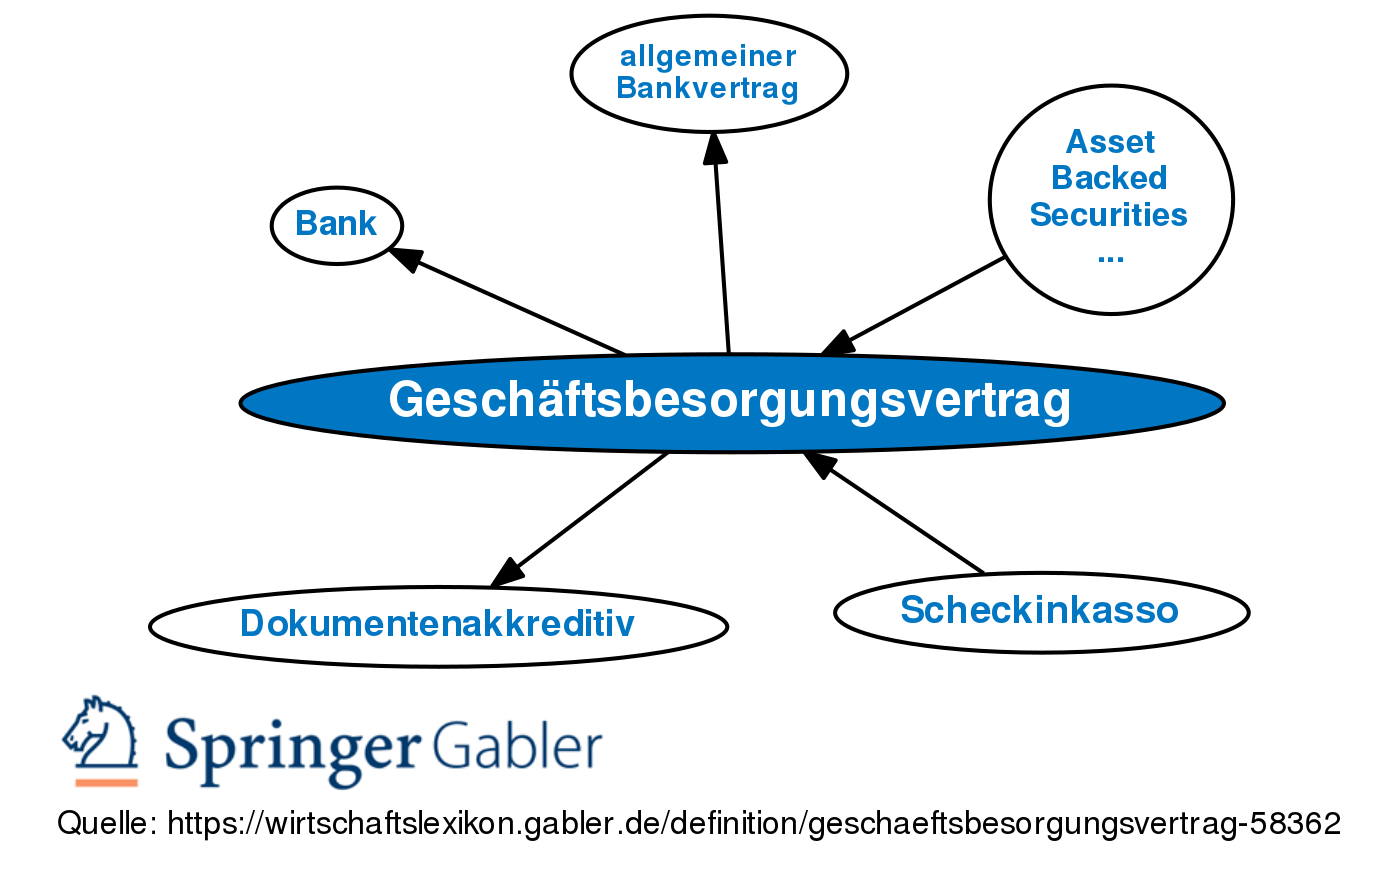 Geschaftsbesorgungsvertrag Definition Gabler Banklexikon